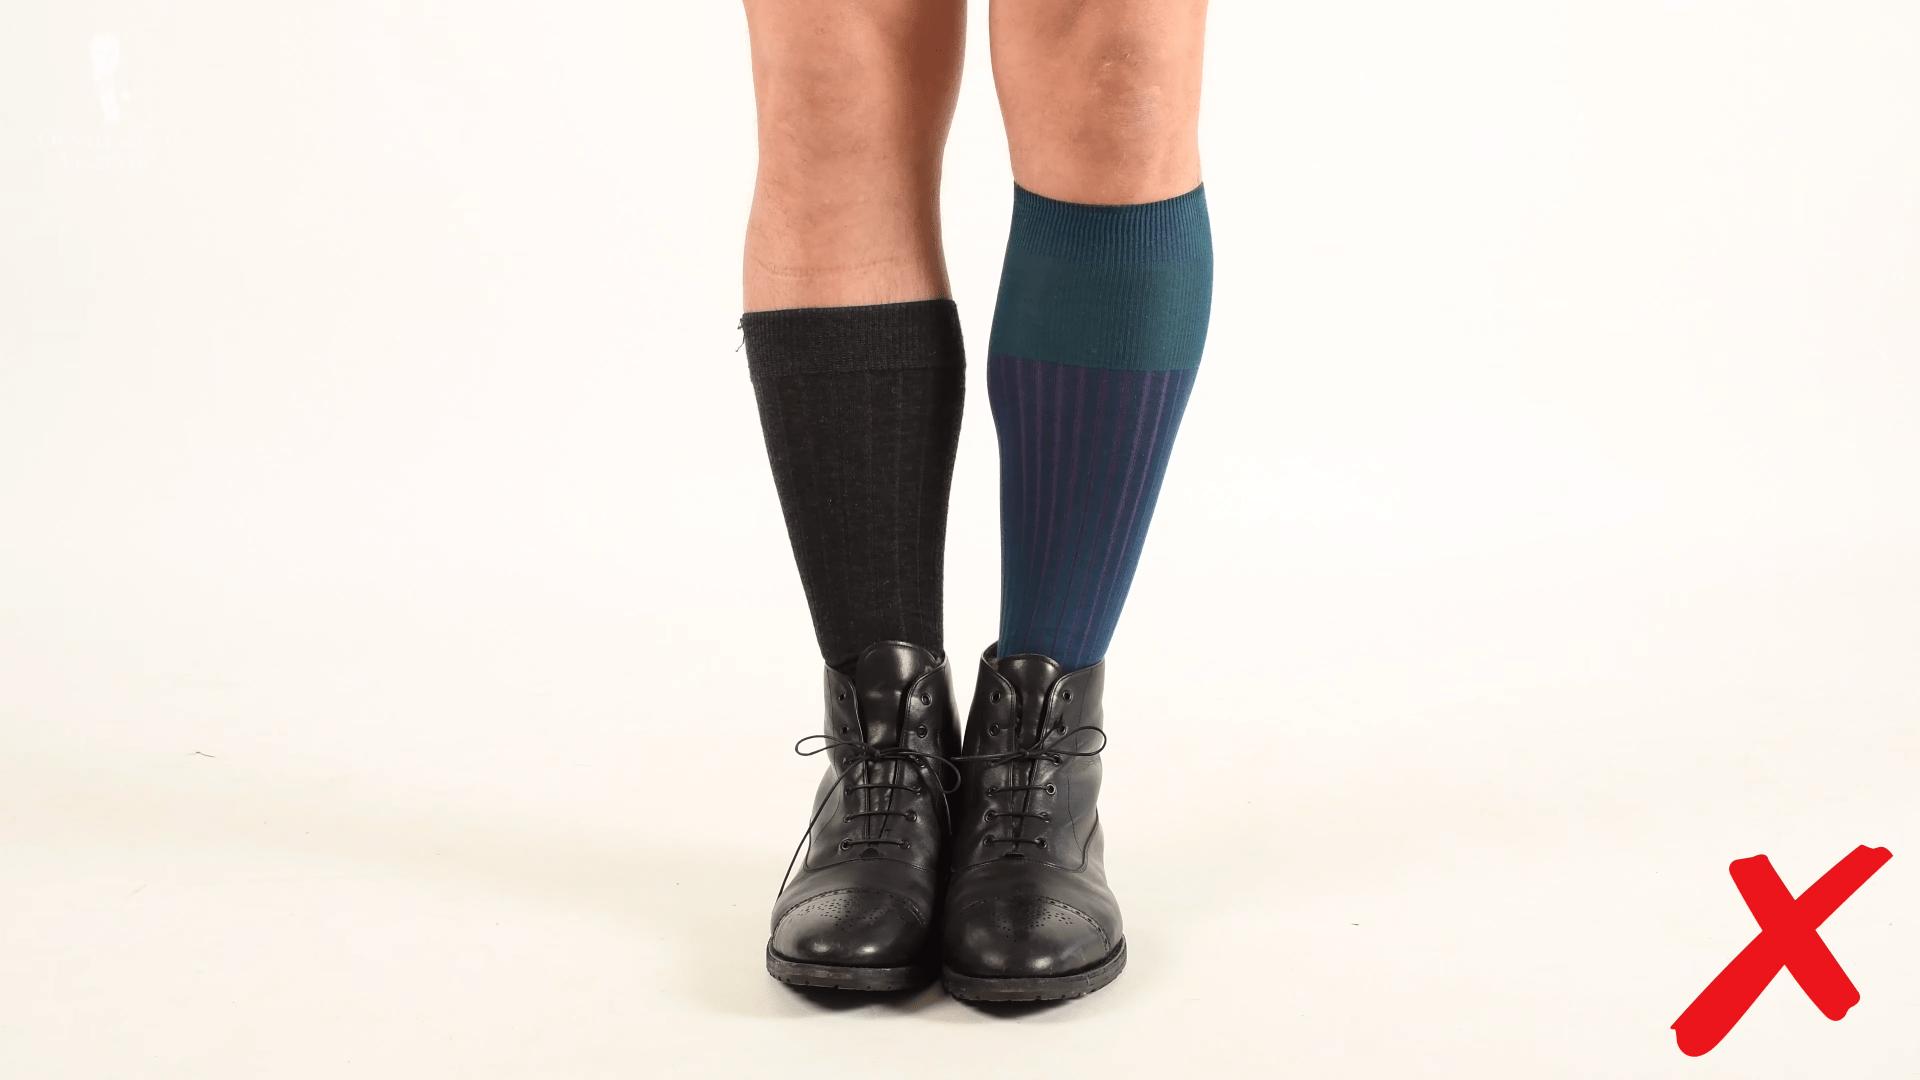 Cashmere socks vs OTC socks